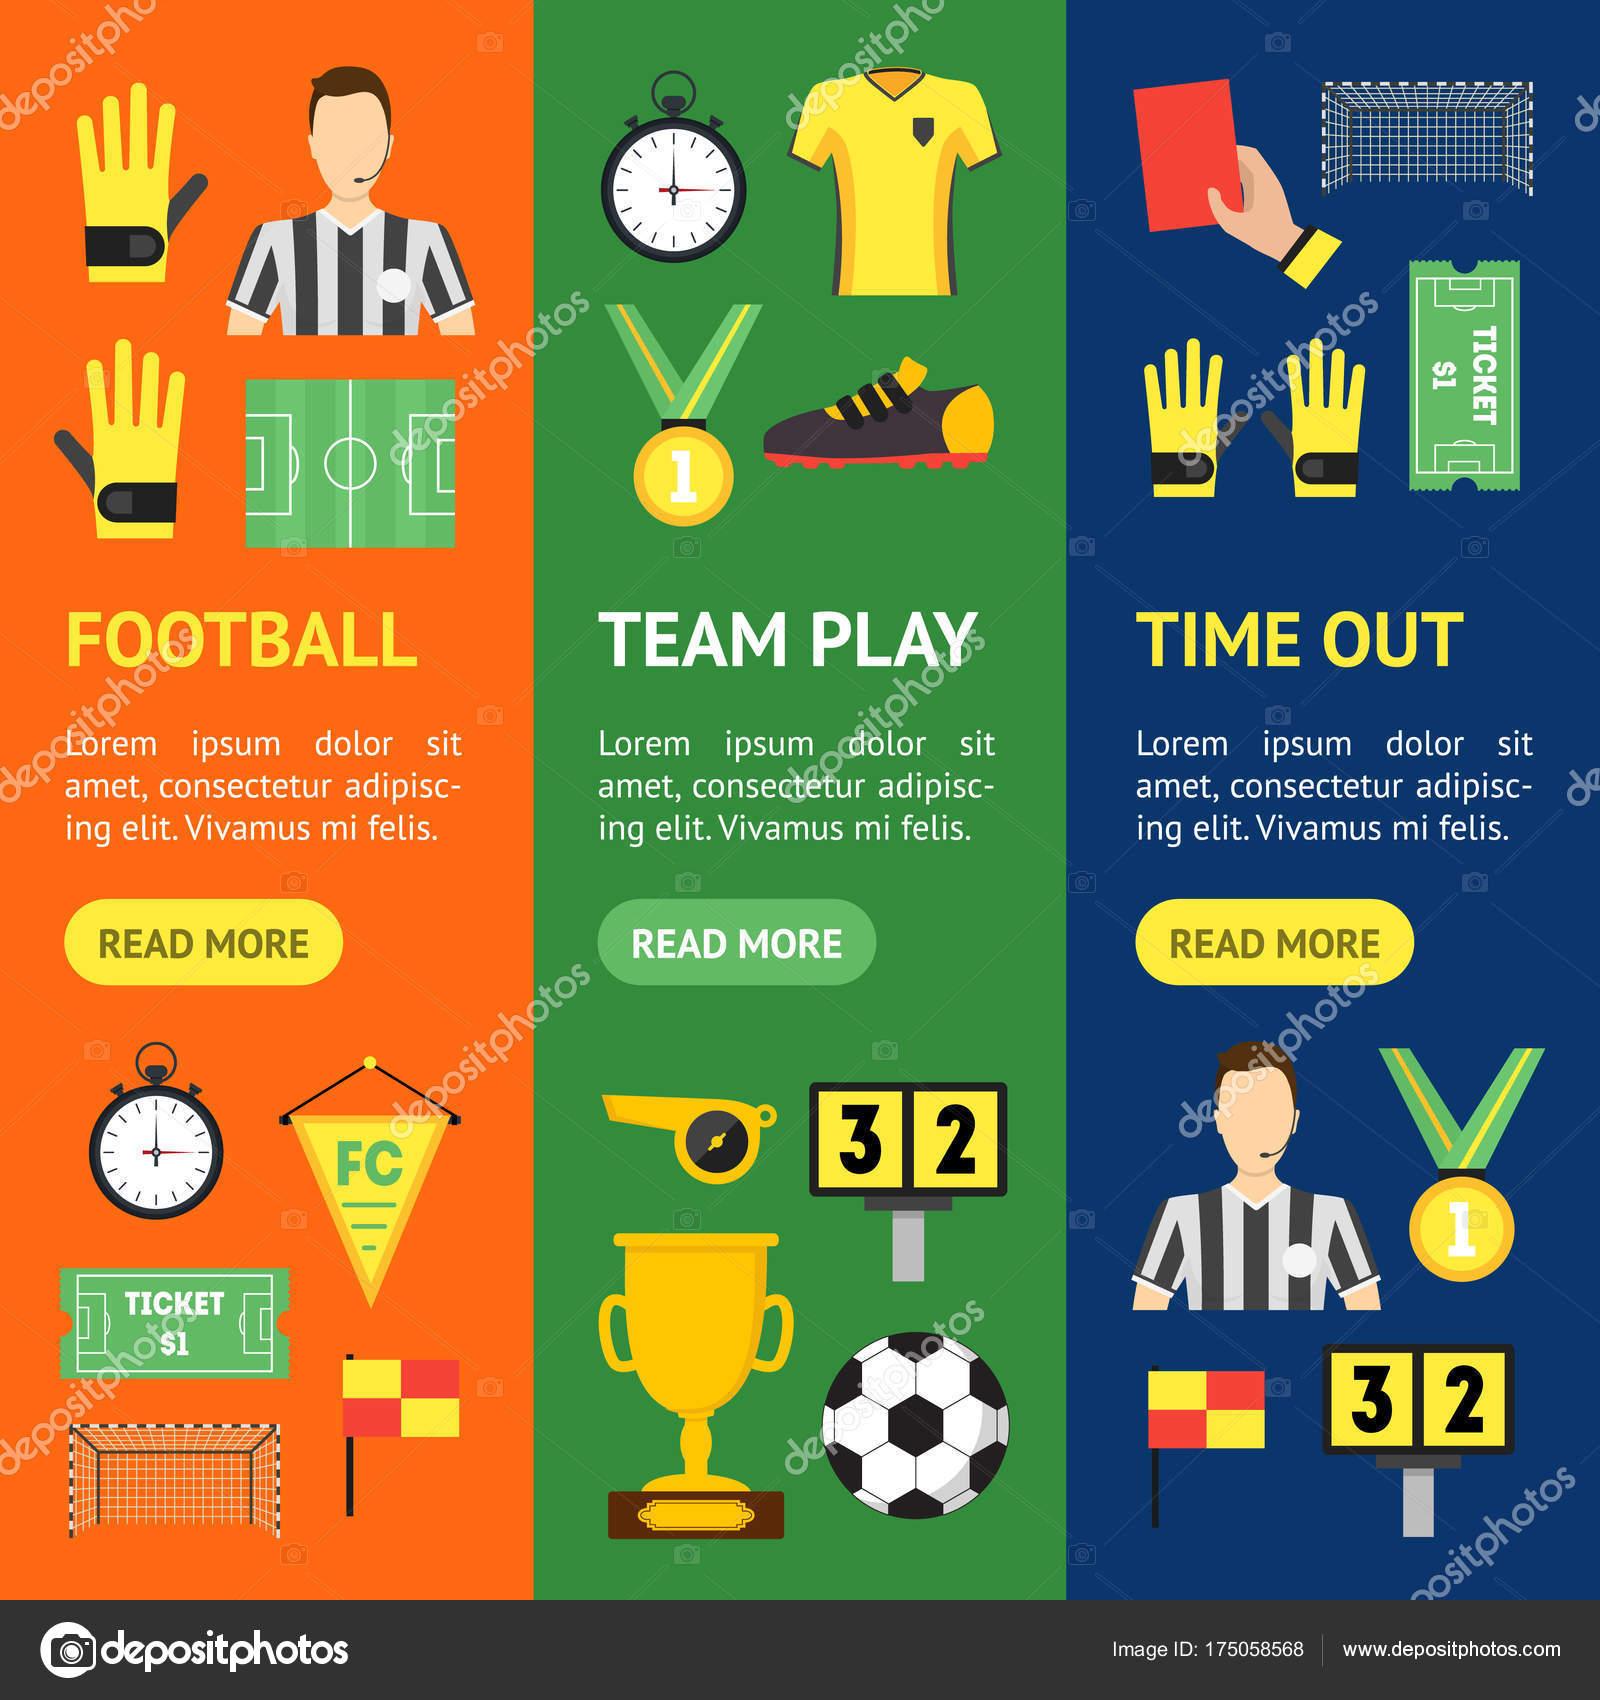 fe591c01f Desenhos animados futebol esporte jogo Banner Vecrtical Set. Vector —  Vetores de Stock